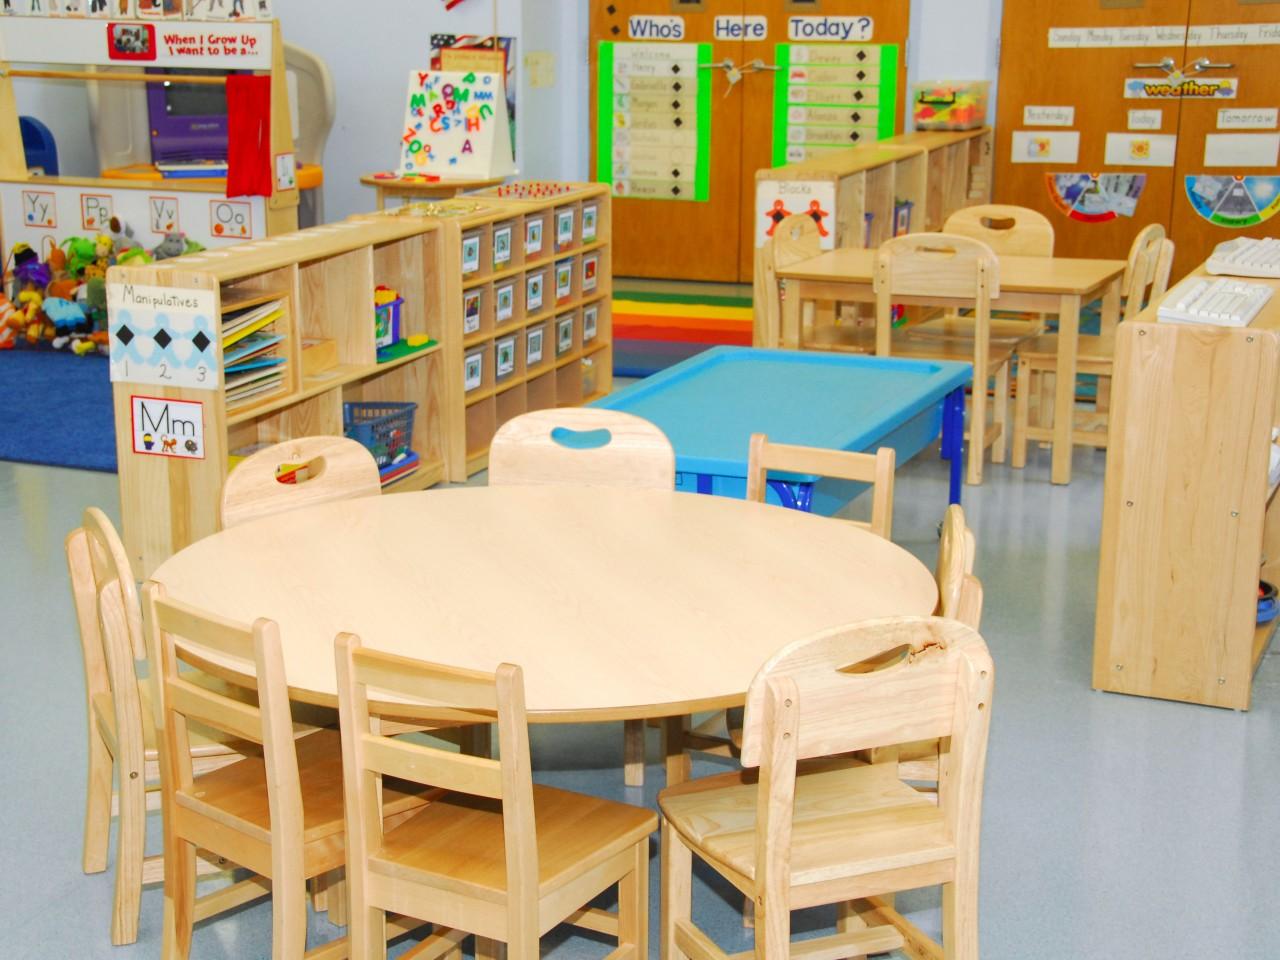 Classroom Design Lakeshore Learning ~ Study american preschools are suspending black children